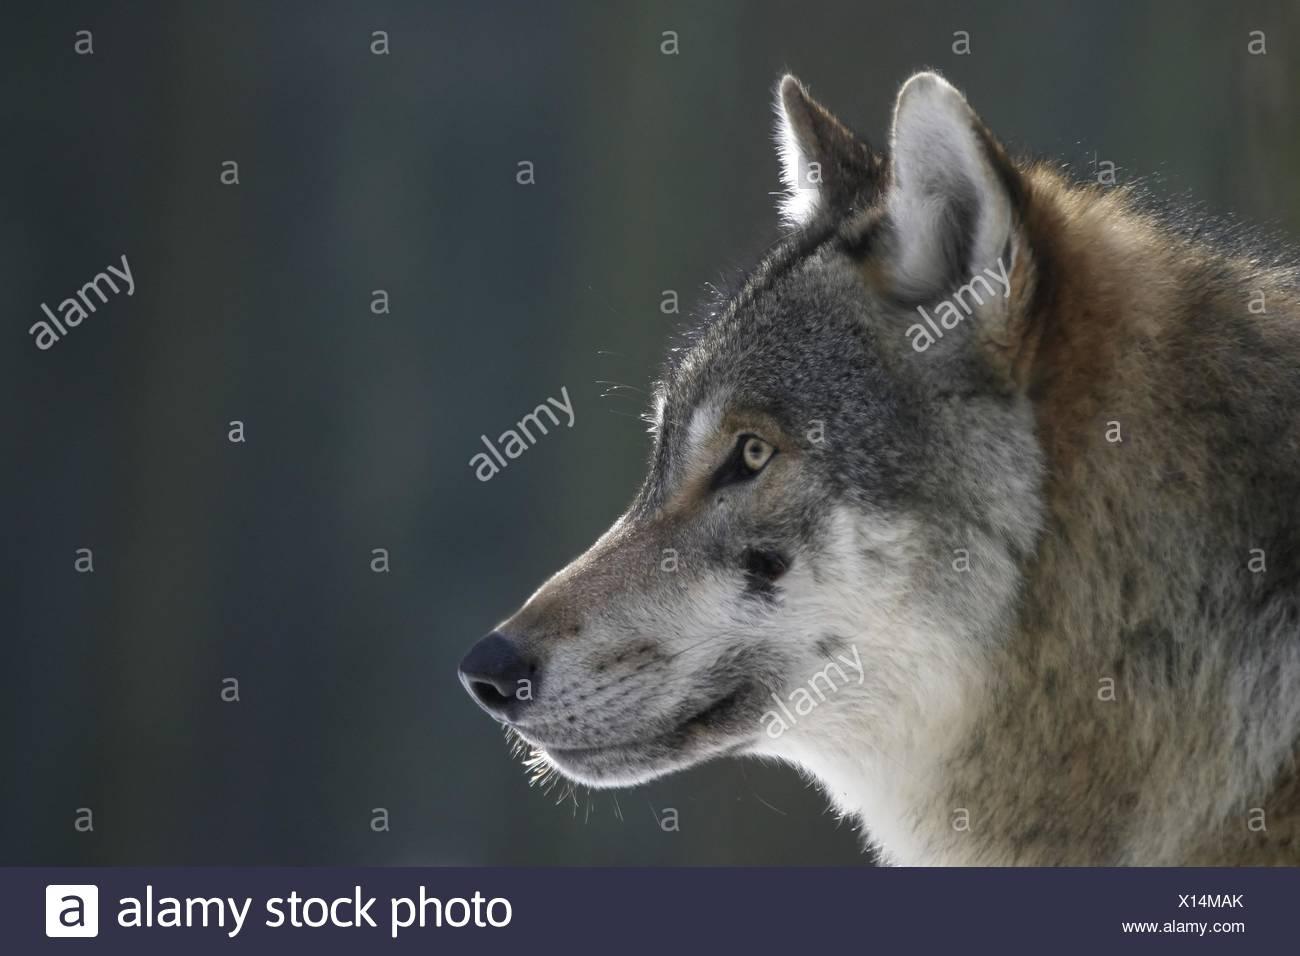 Retrato de lobo europeo Imagen De Stock